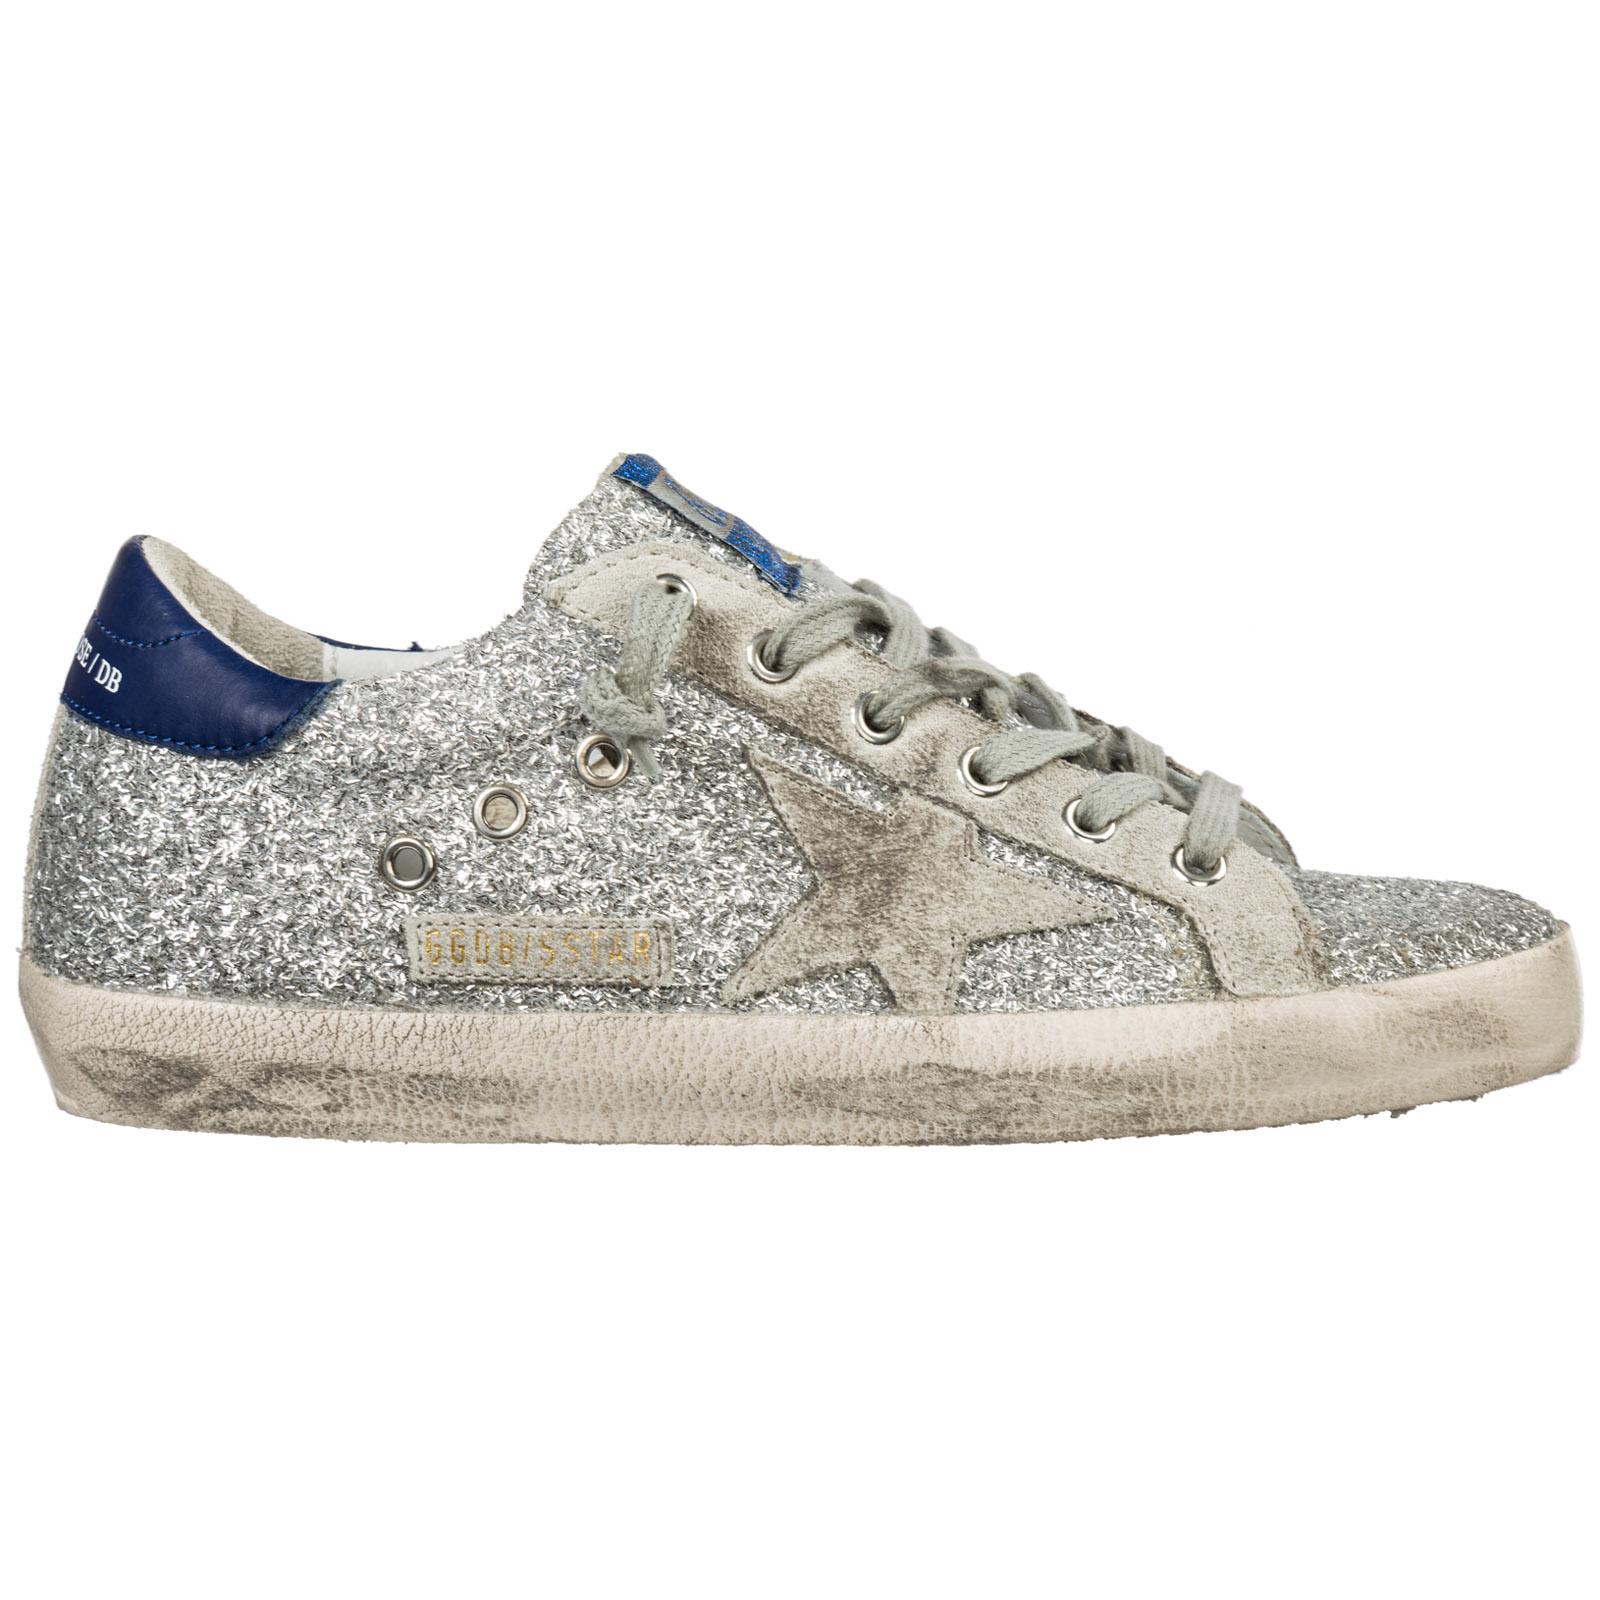 406f1e49438 Shop Women Shoes | ModeSens